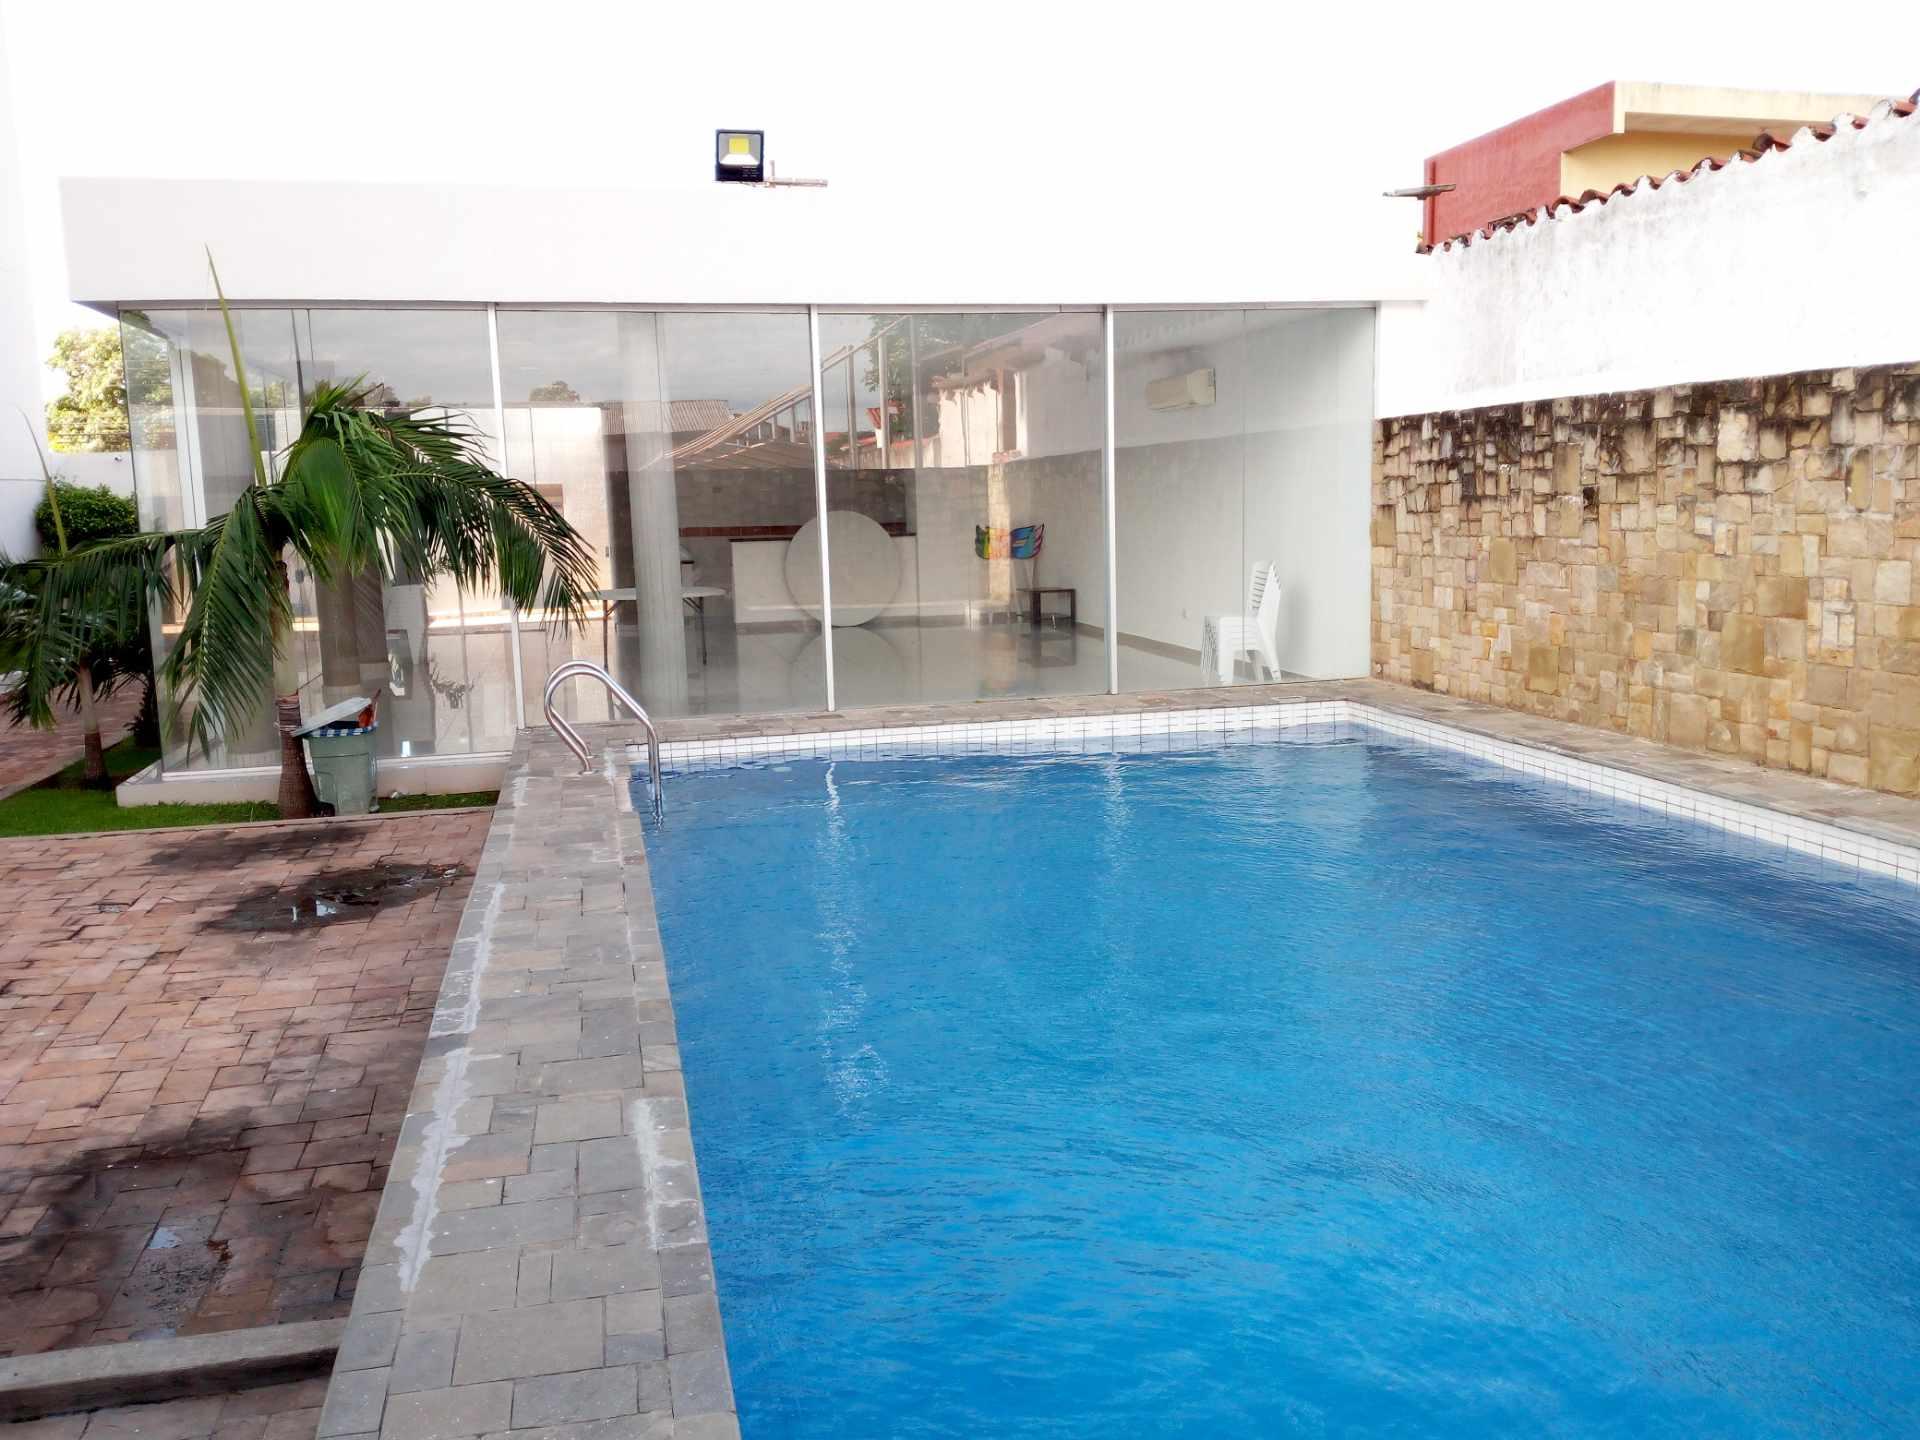 Departamento en Venta Entre 3er y 2do Anillo, Av. Guapay (Canal Cotoca) Foto 13